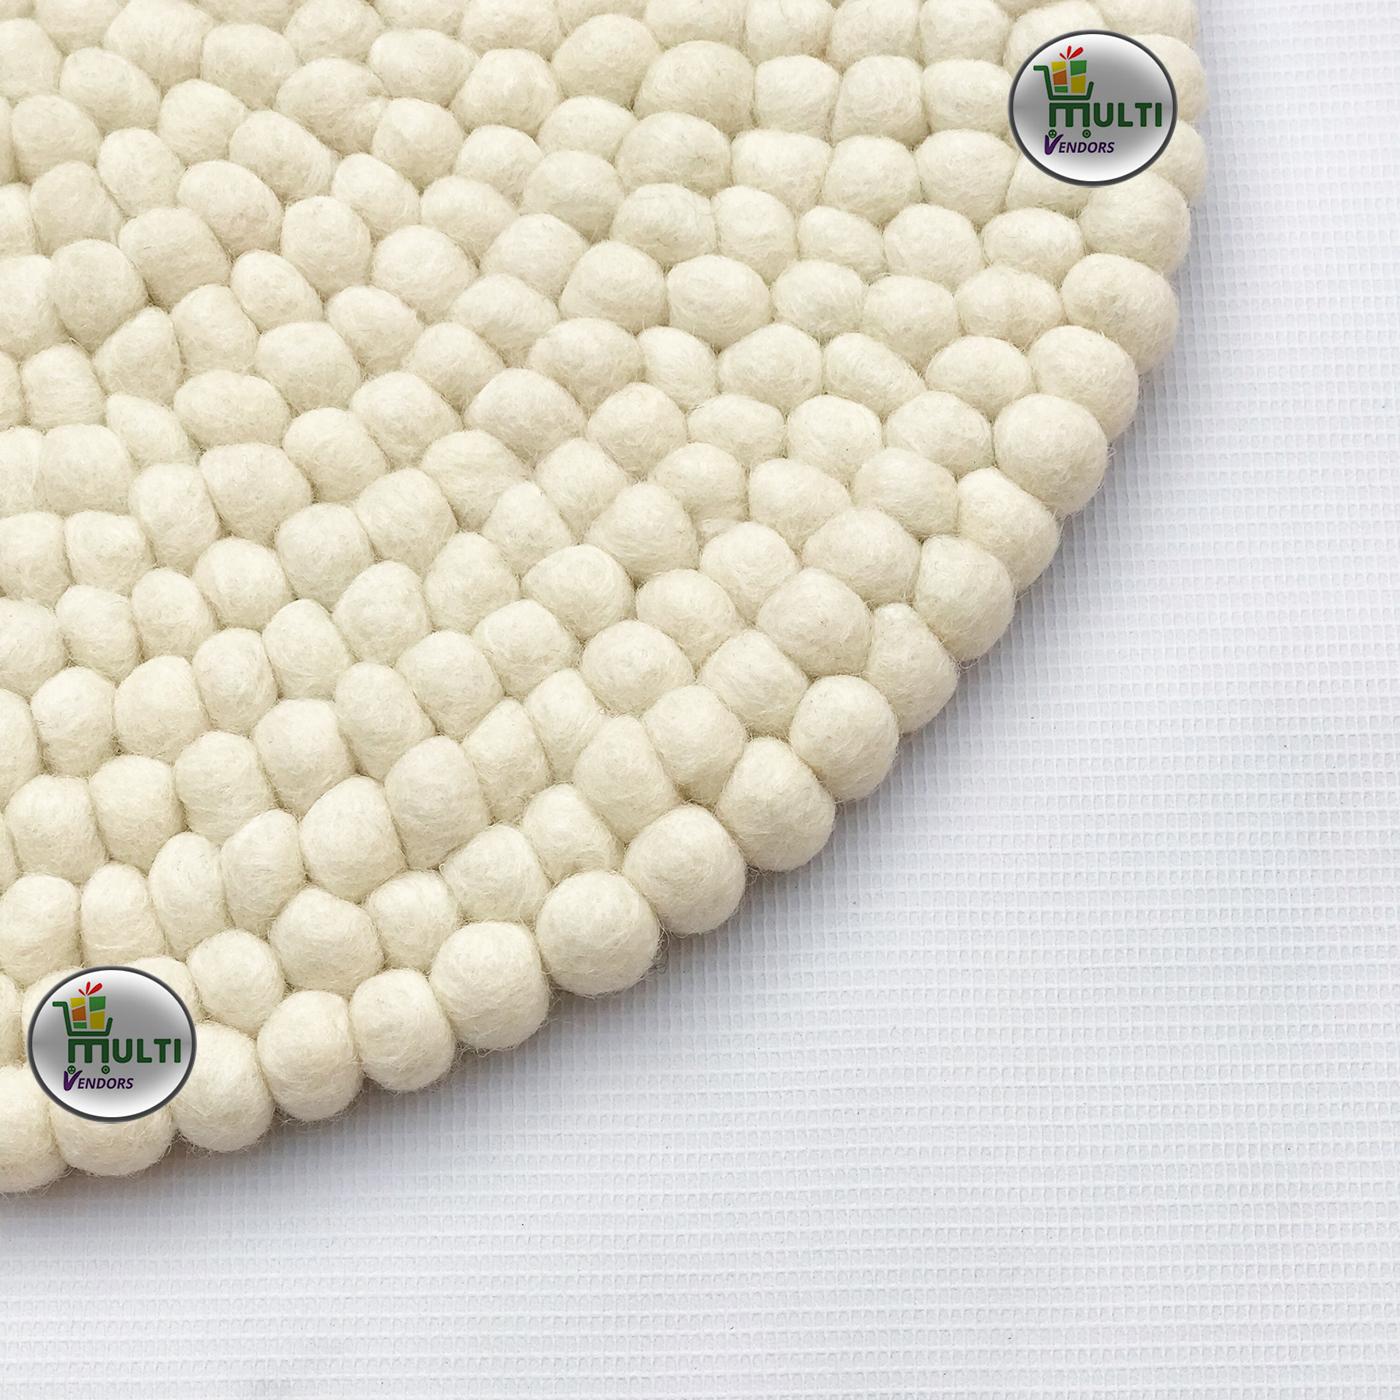 Round  Natural White Felt Ball Rug -PW-21520